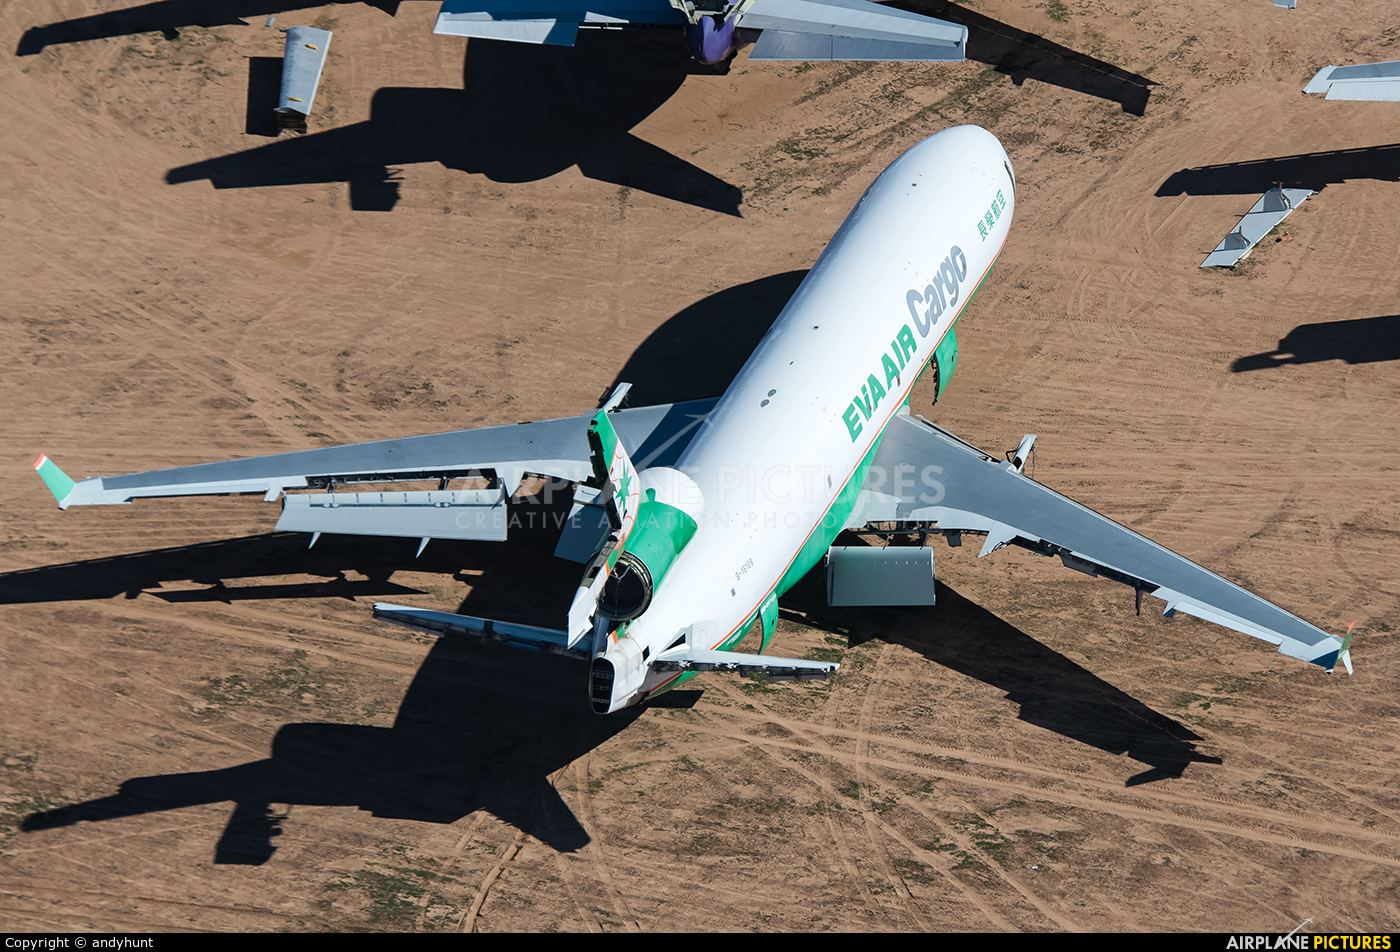 EVA Air Cargo B-16108 aircraft at Victorville - Southern California Logistics